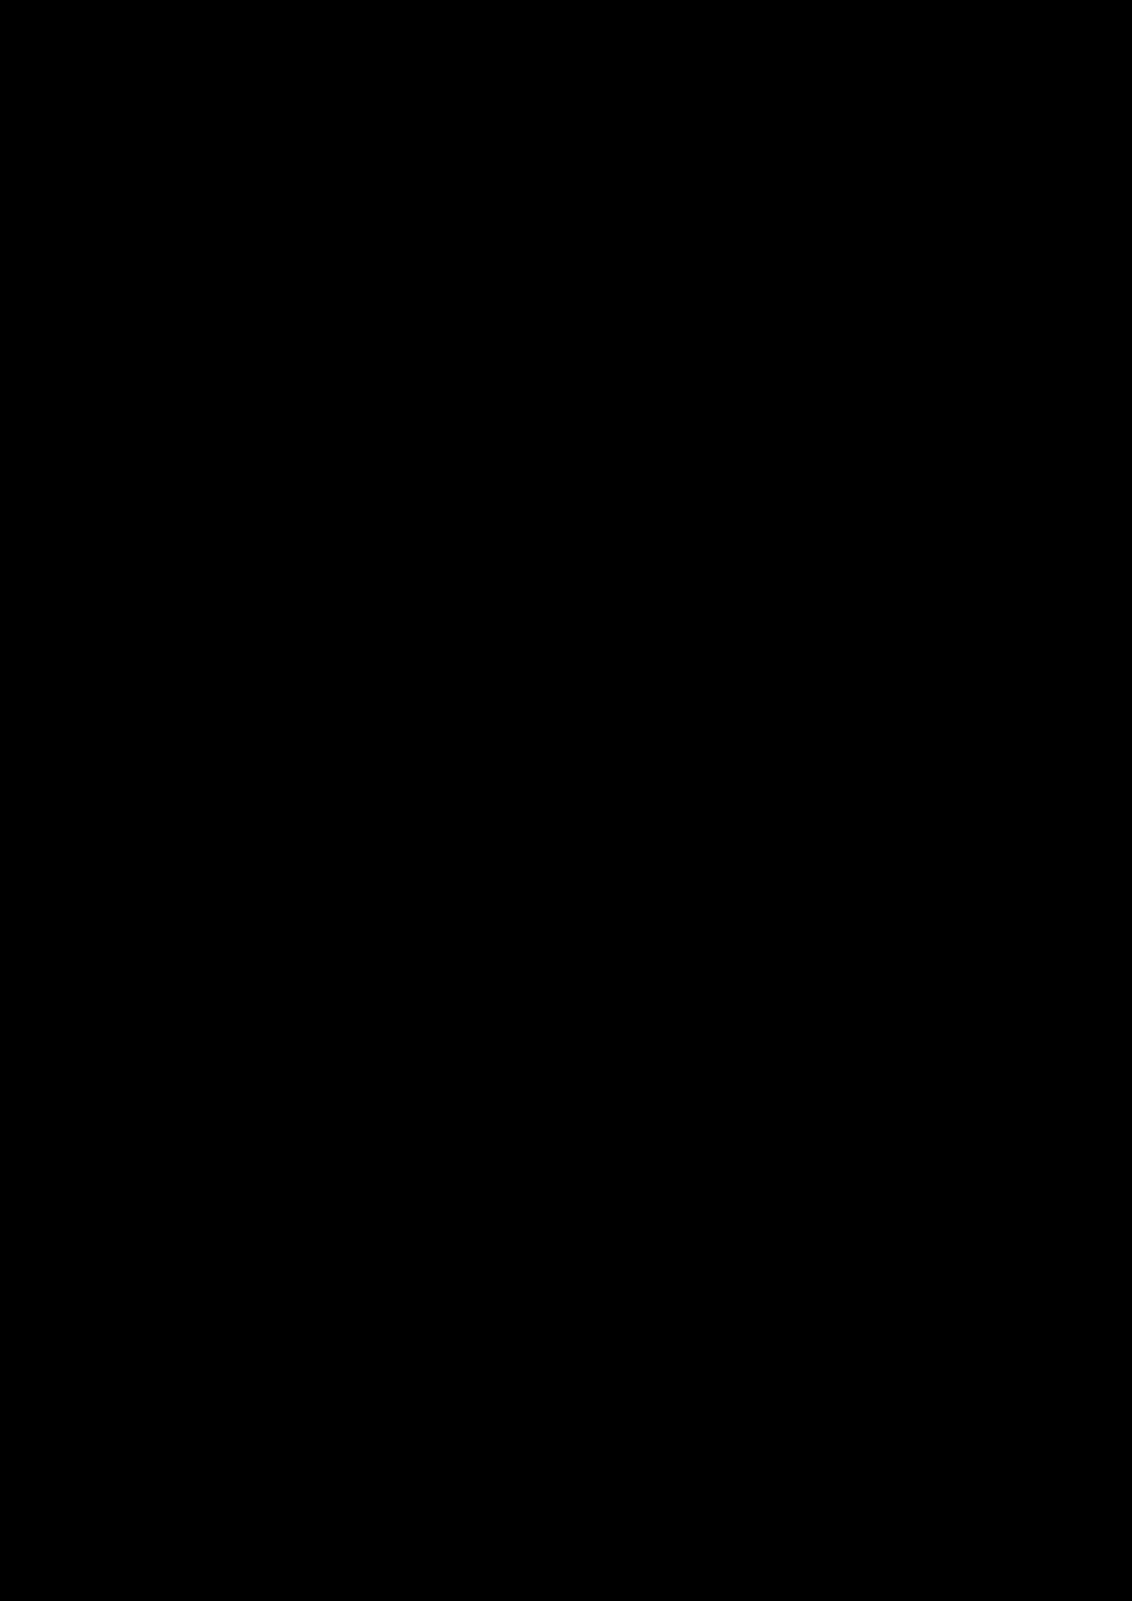 Okean Pustotyi slide, Image 15